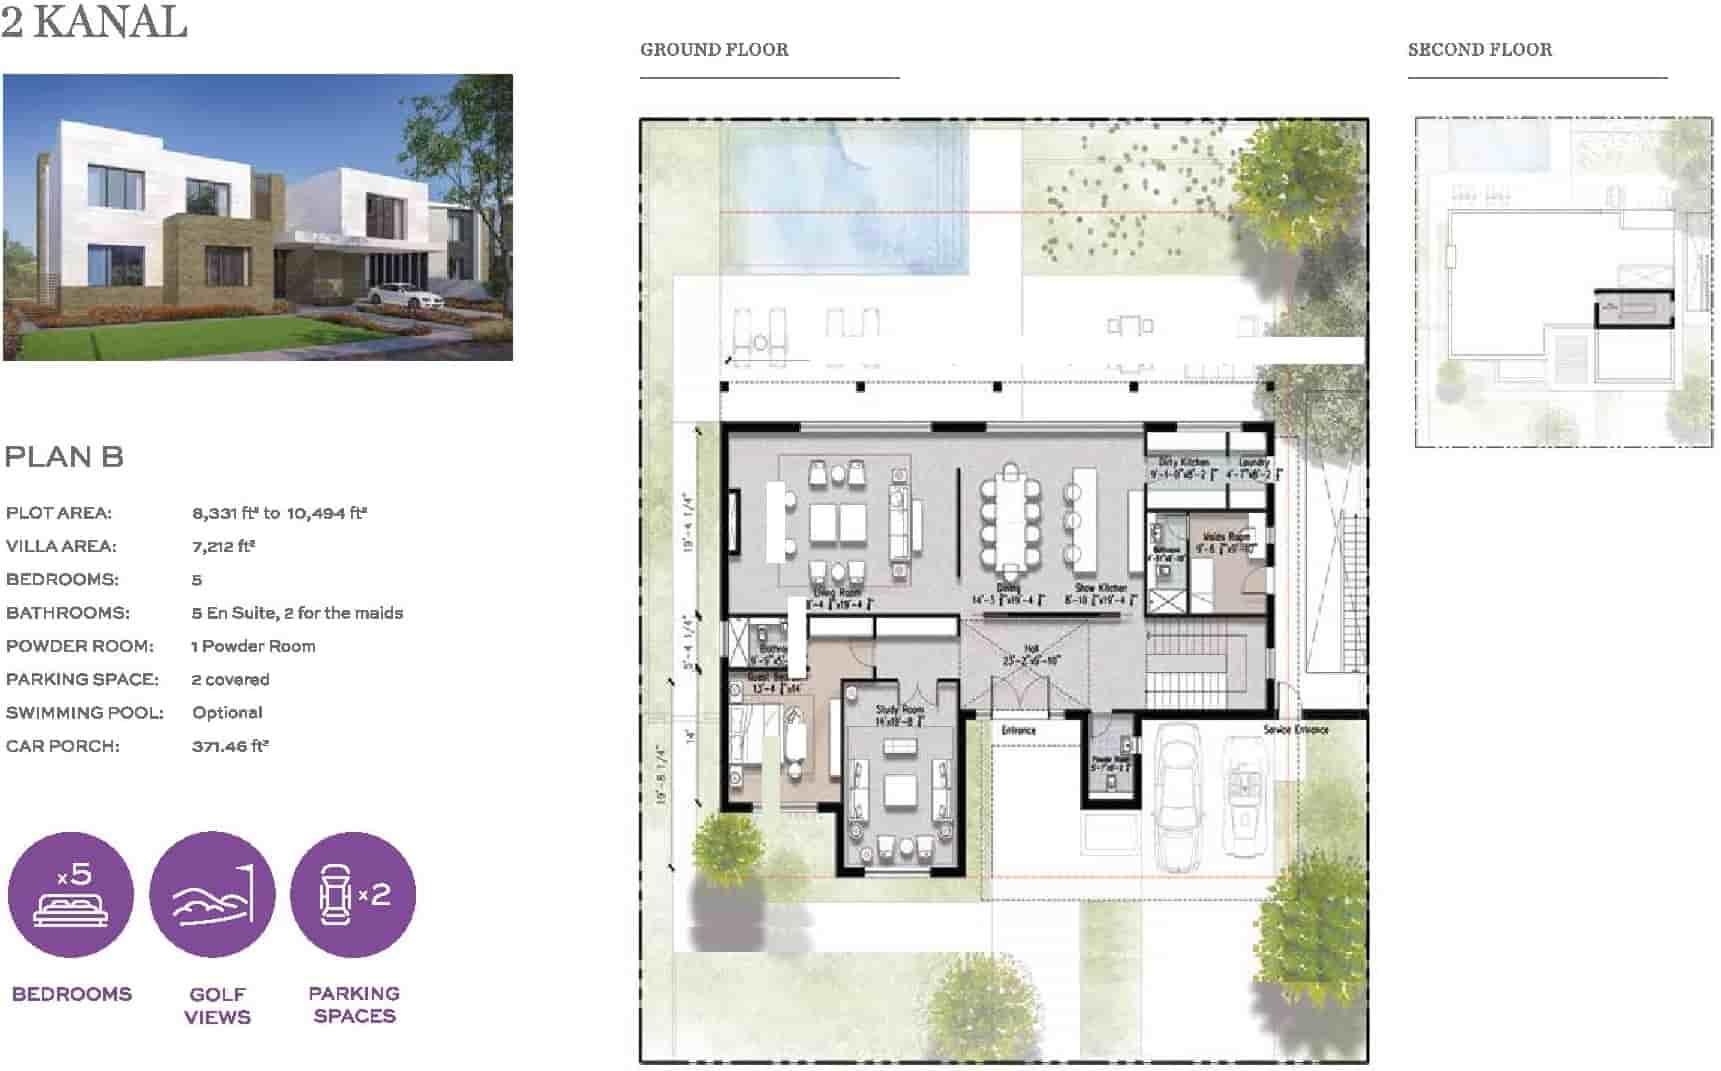 Eighteen 2 Kanal Villa Plan B